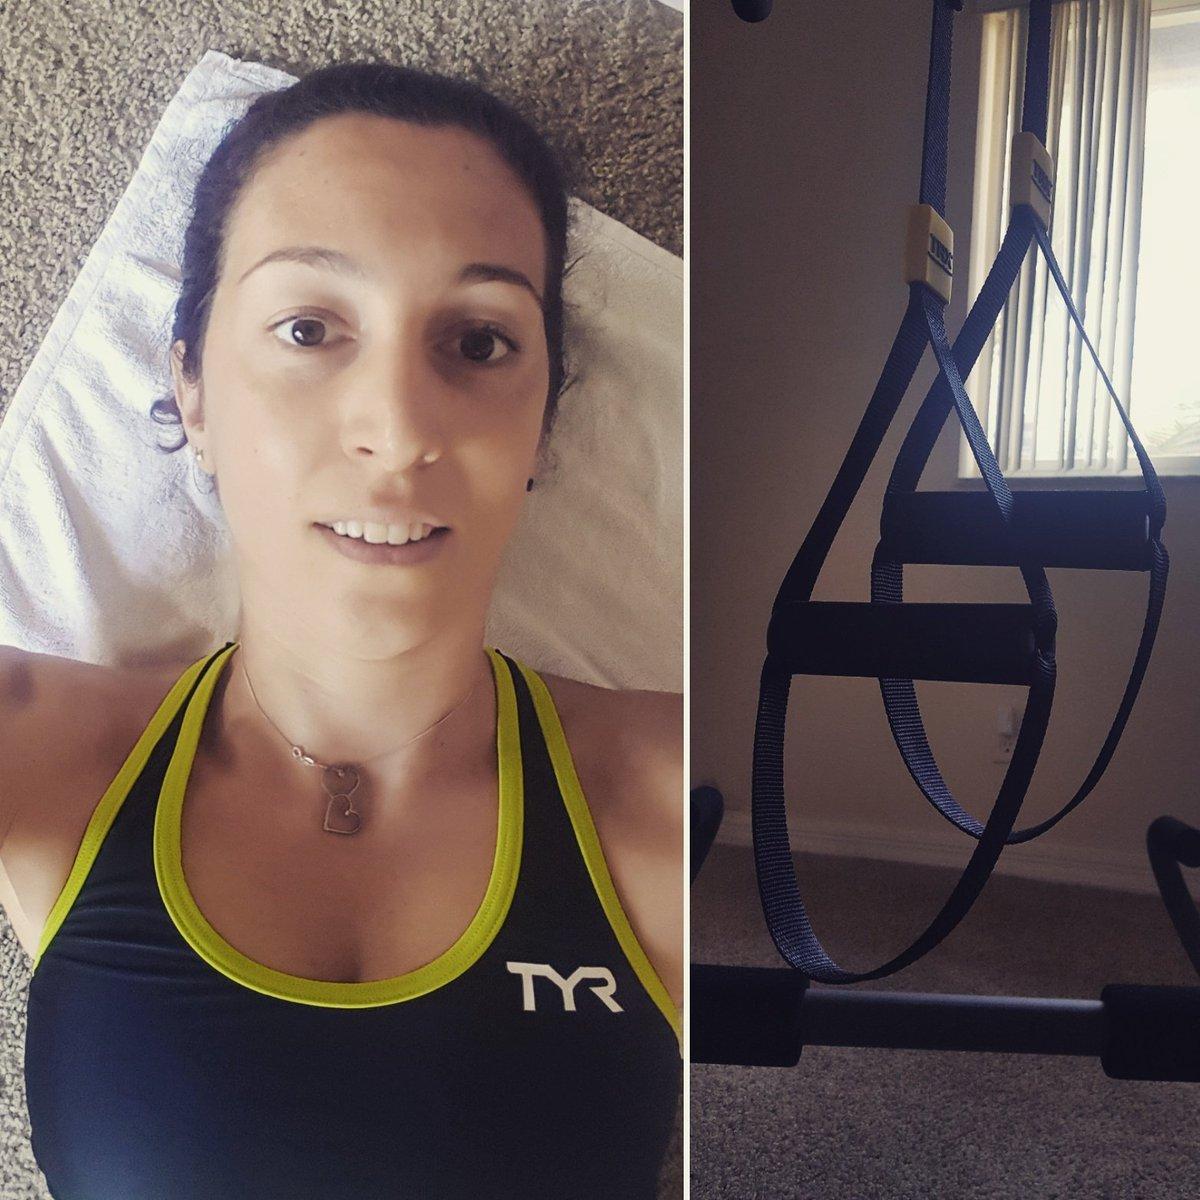 Morning training! #trxworkout #trx #thursday #workout #coreworkout #core #abs #tired #timetowork #morning #morningmotivation #livetothrive<br>http://pic.twitter.com/85m2Xv3v4F